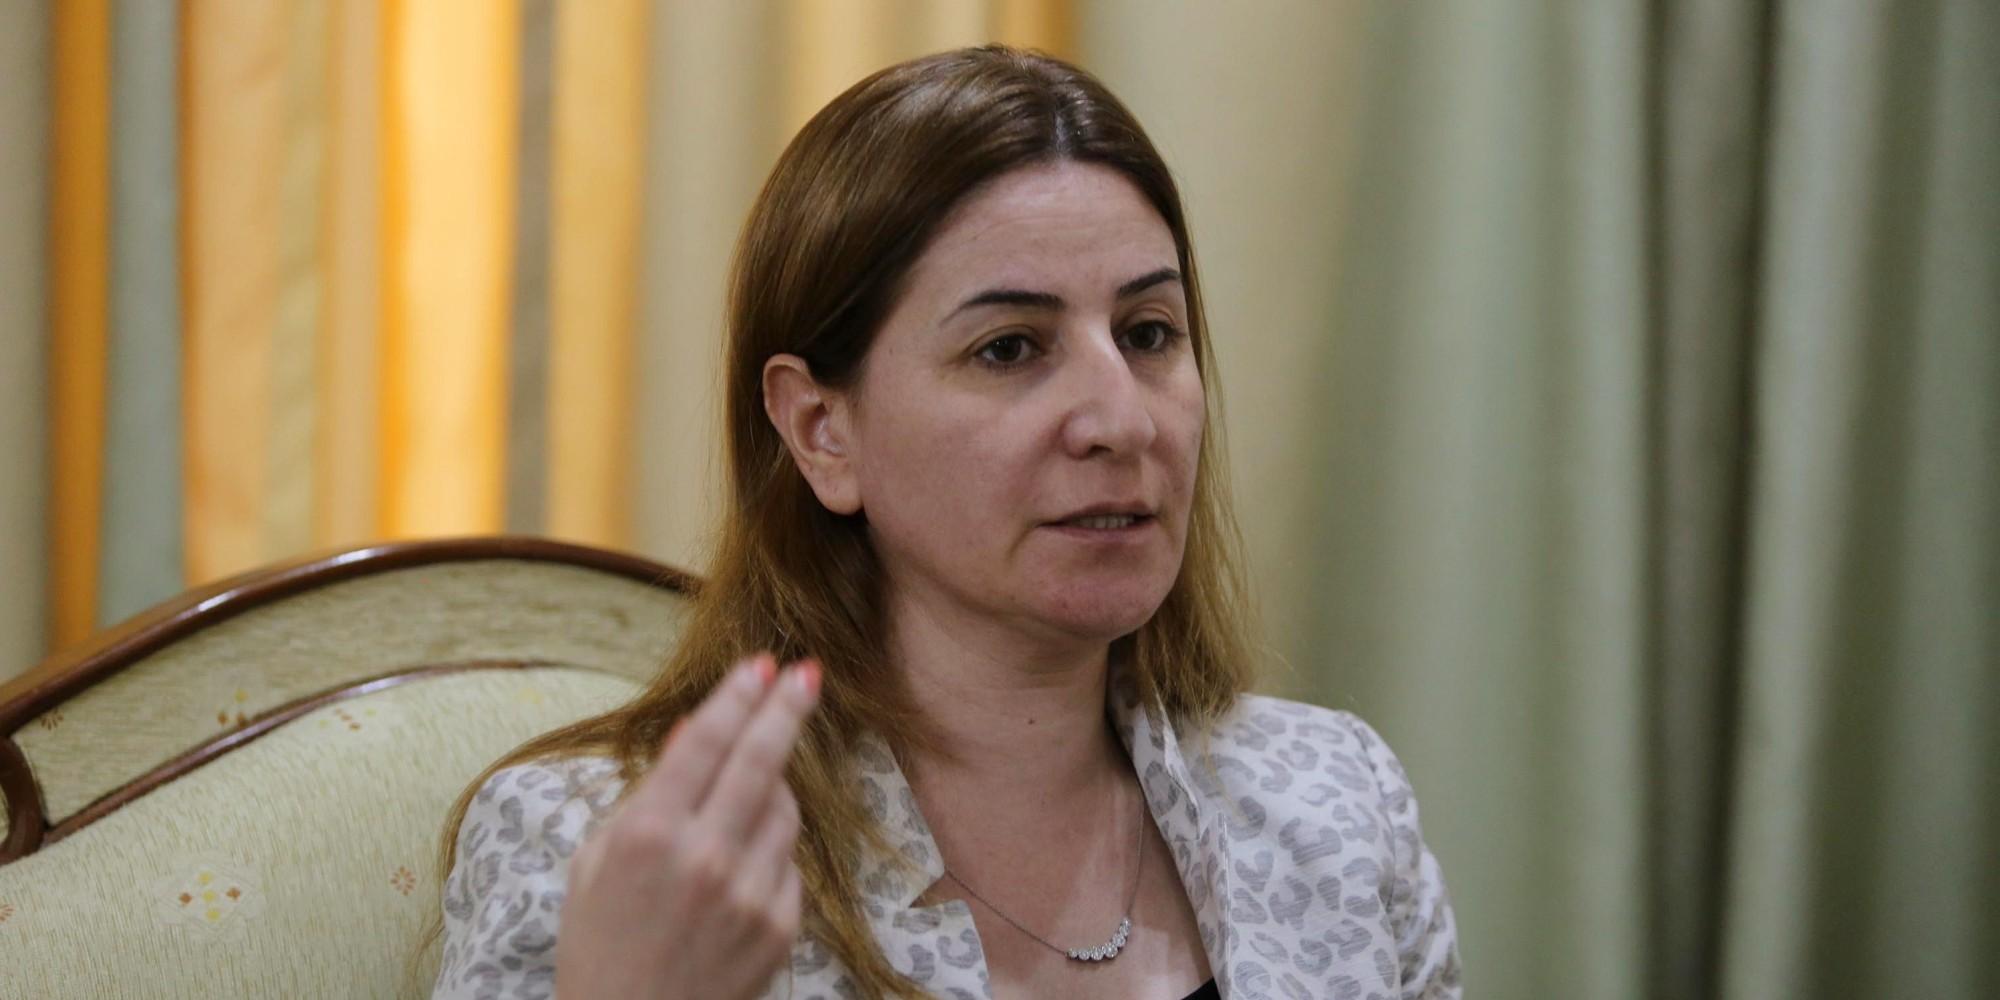 Vian Dakhil fordert für den abgesetzten Peshmerga-Minister die Todesstrafe (Mohammed Sawaf/AFP)